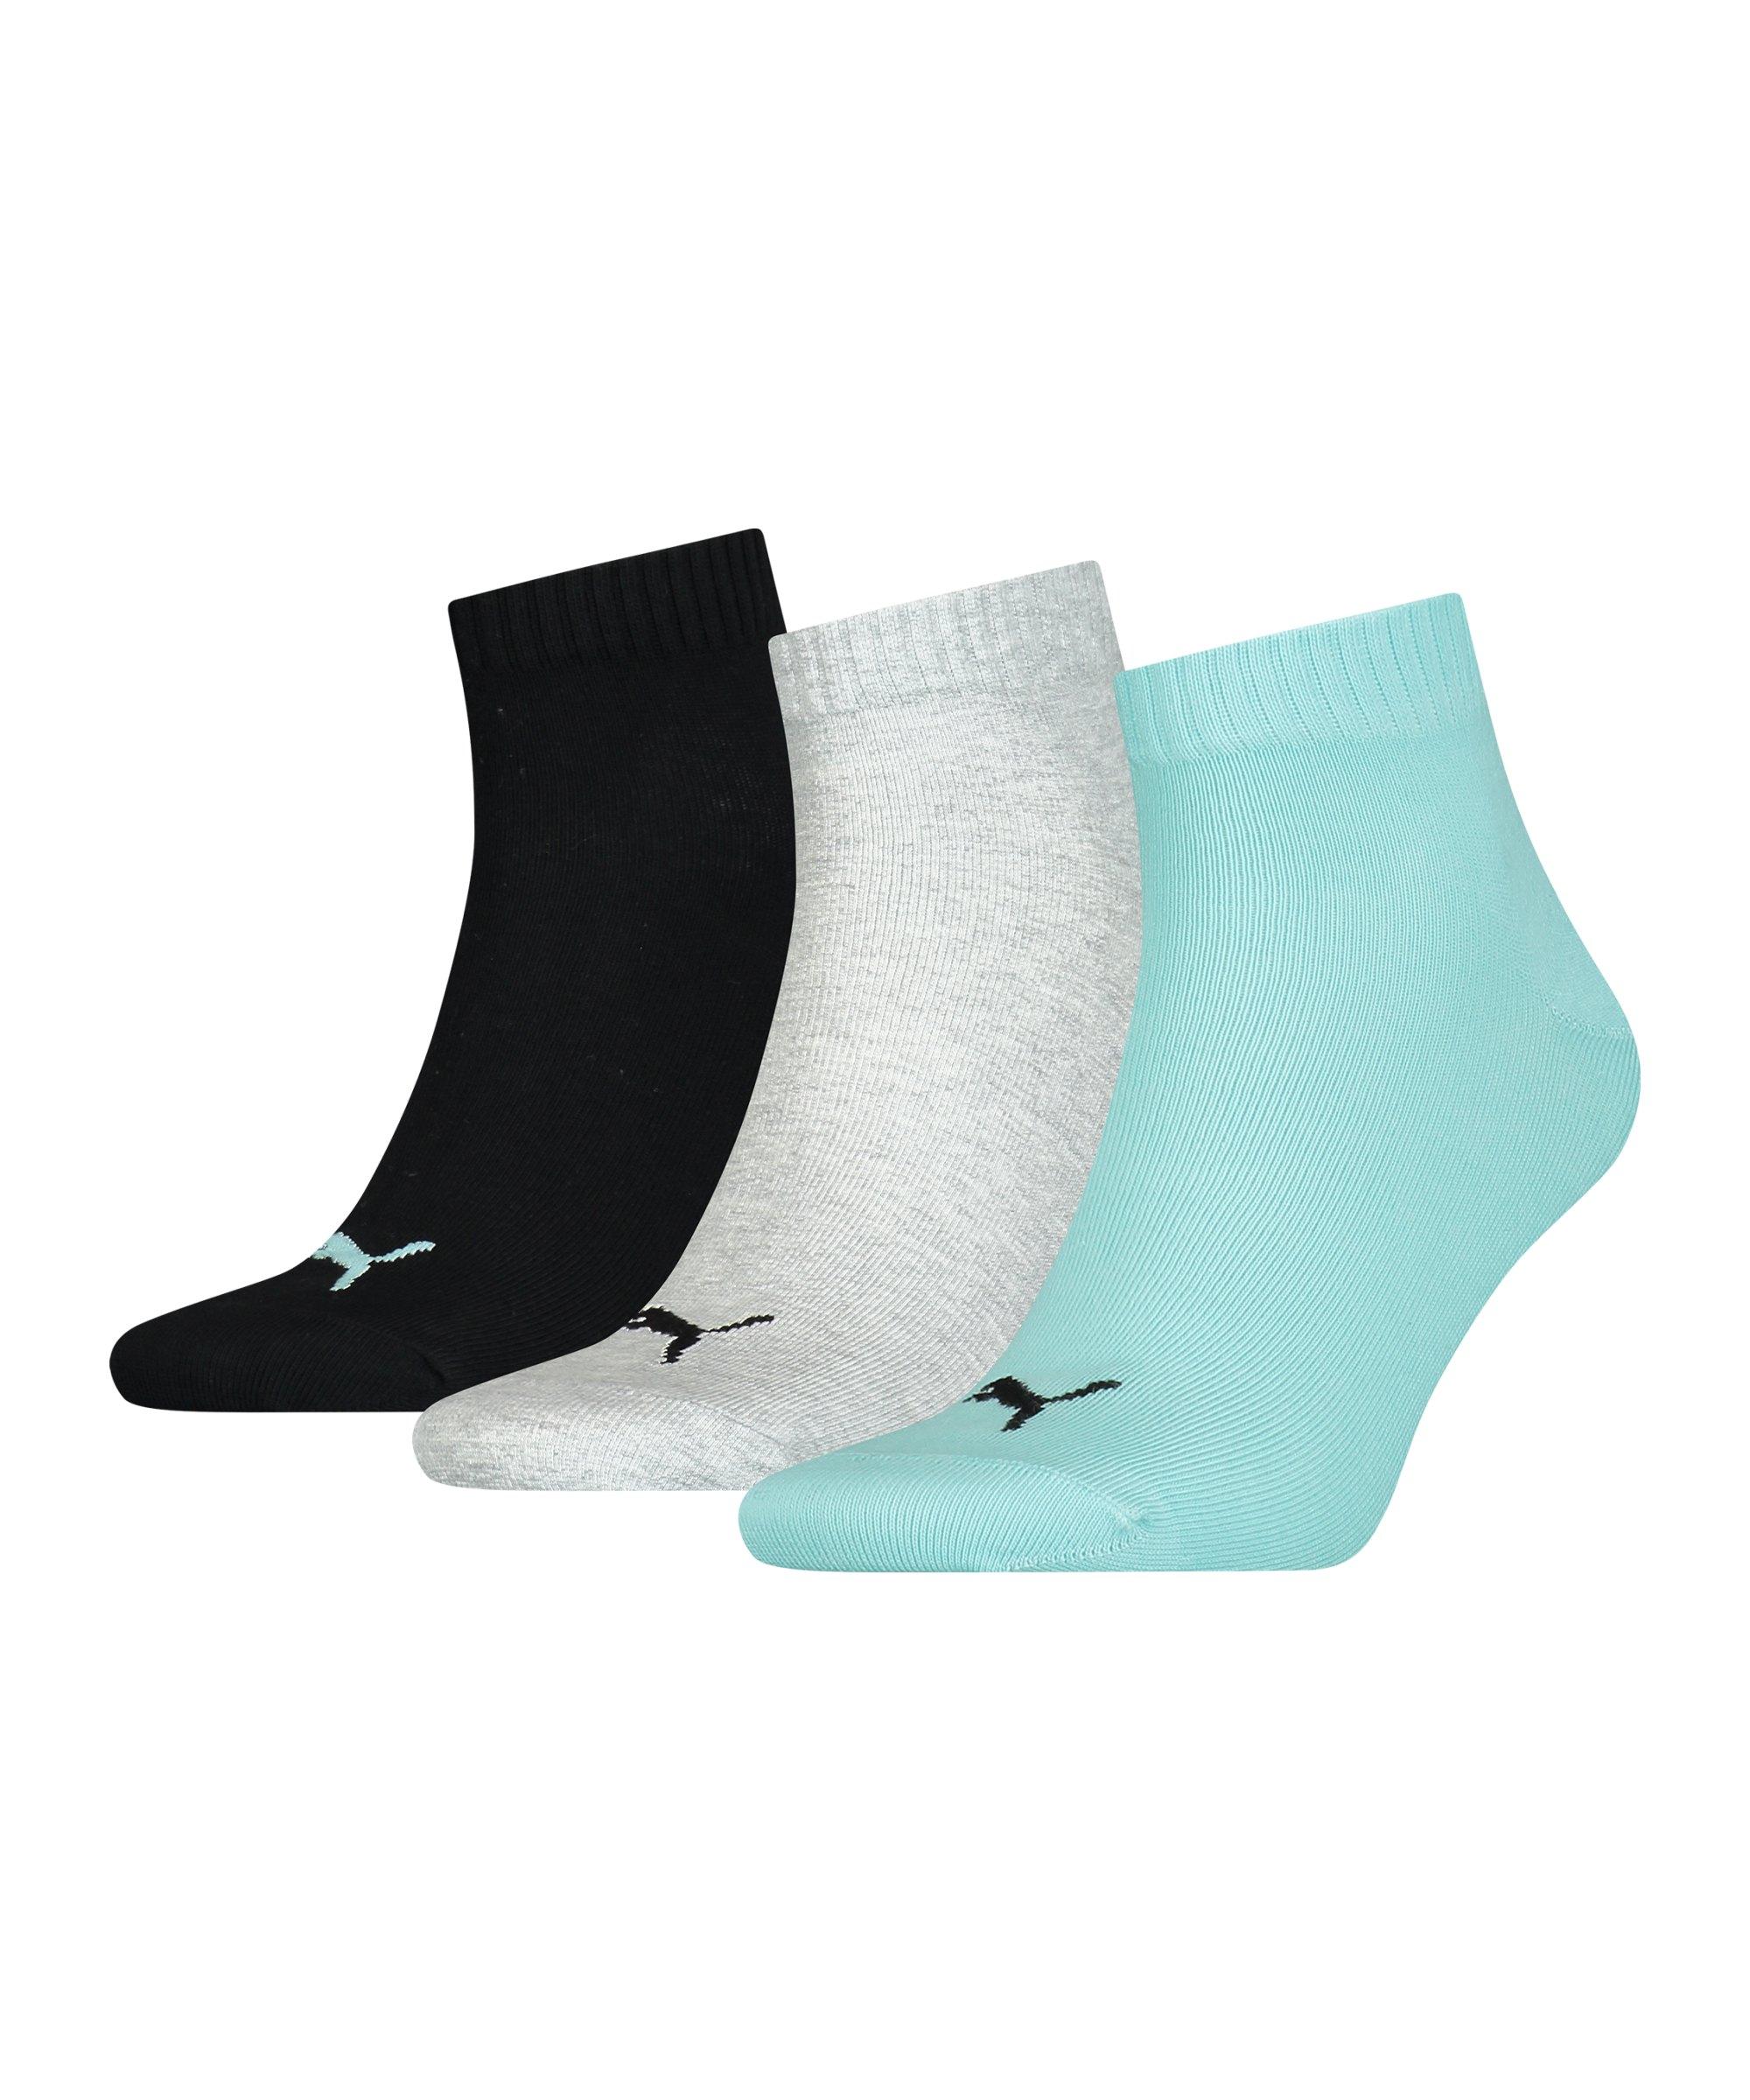 PUMA Unisex Quarter Plain 3er Pack Socken F014 - mehrfarbig